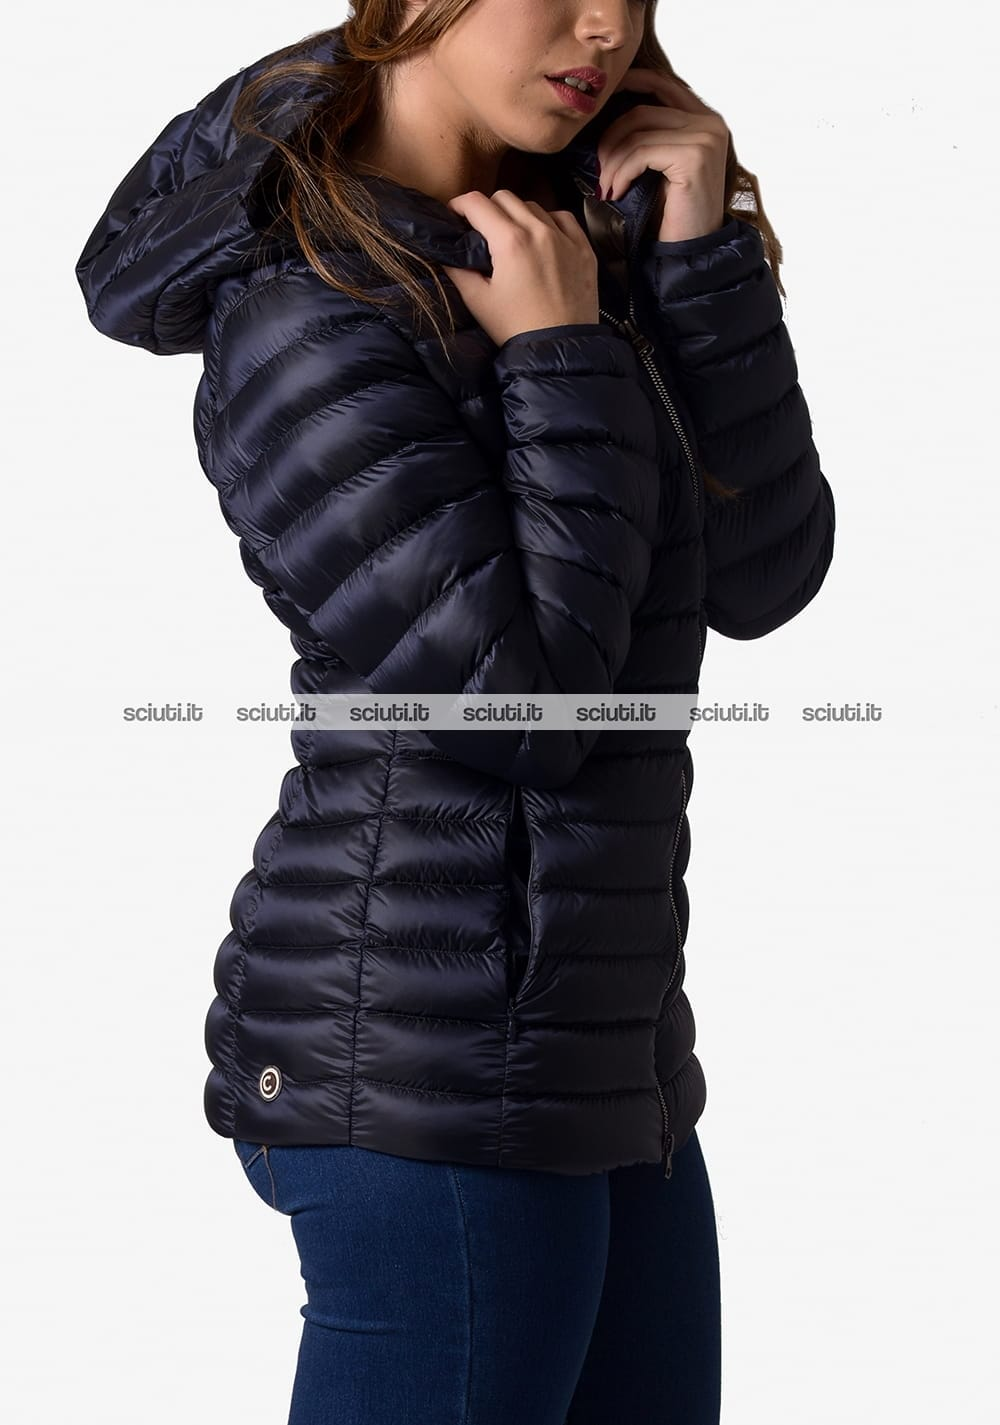 official photos cc946 07bf3 Piumino pesante Colmar donna con cappuccio blu scuro